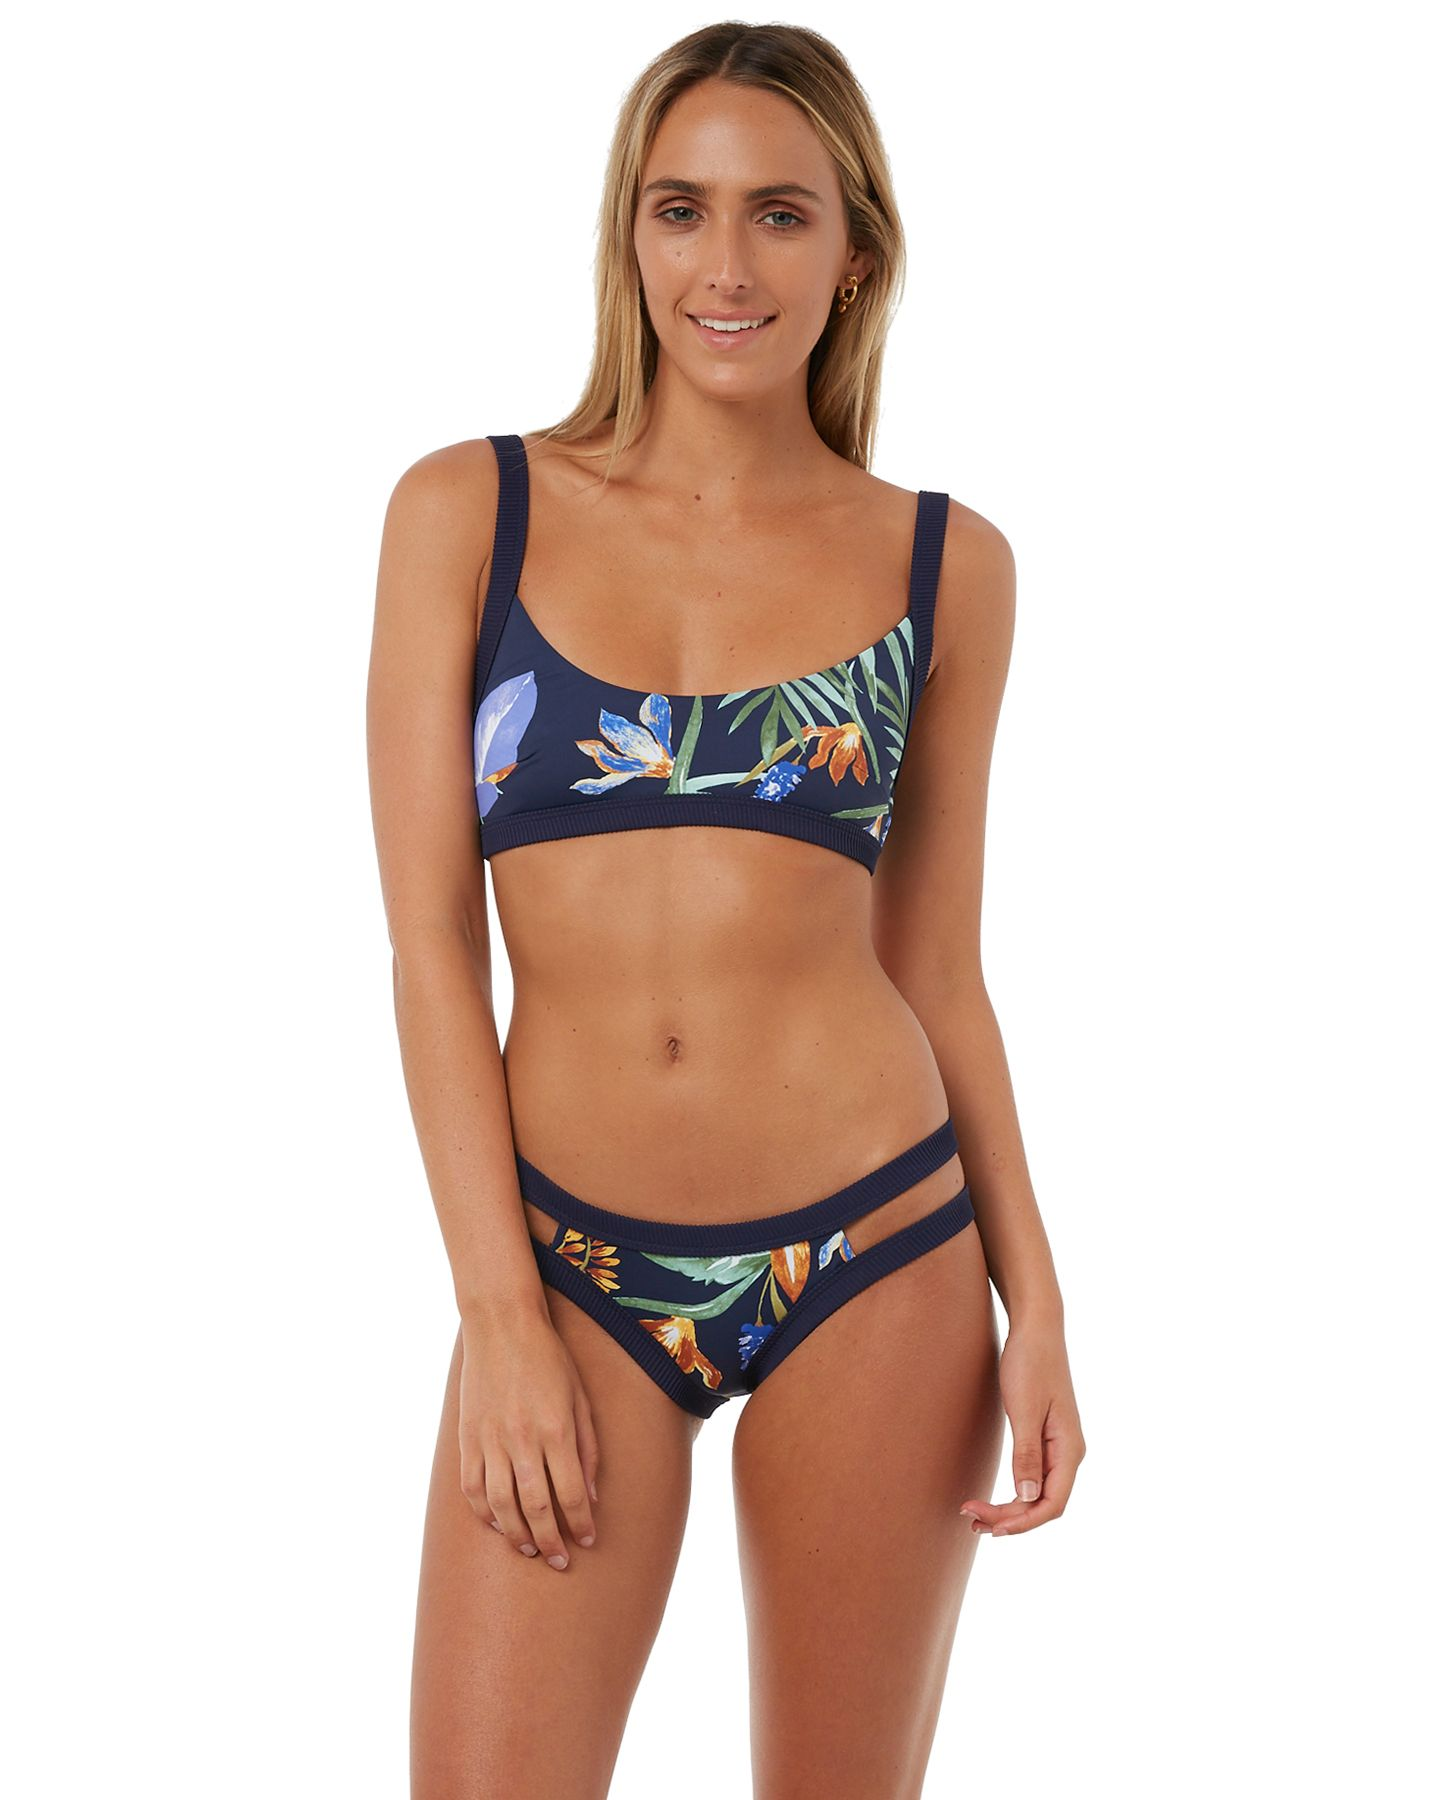 8141b401062 Zulu And Zephyr Jewelflower Bralette Bikini - Multi